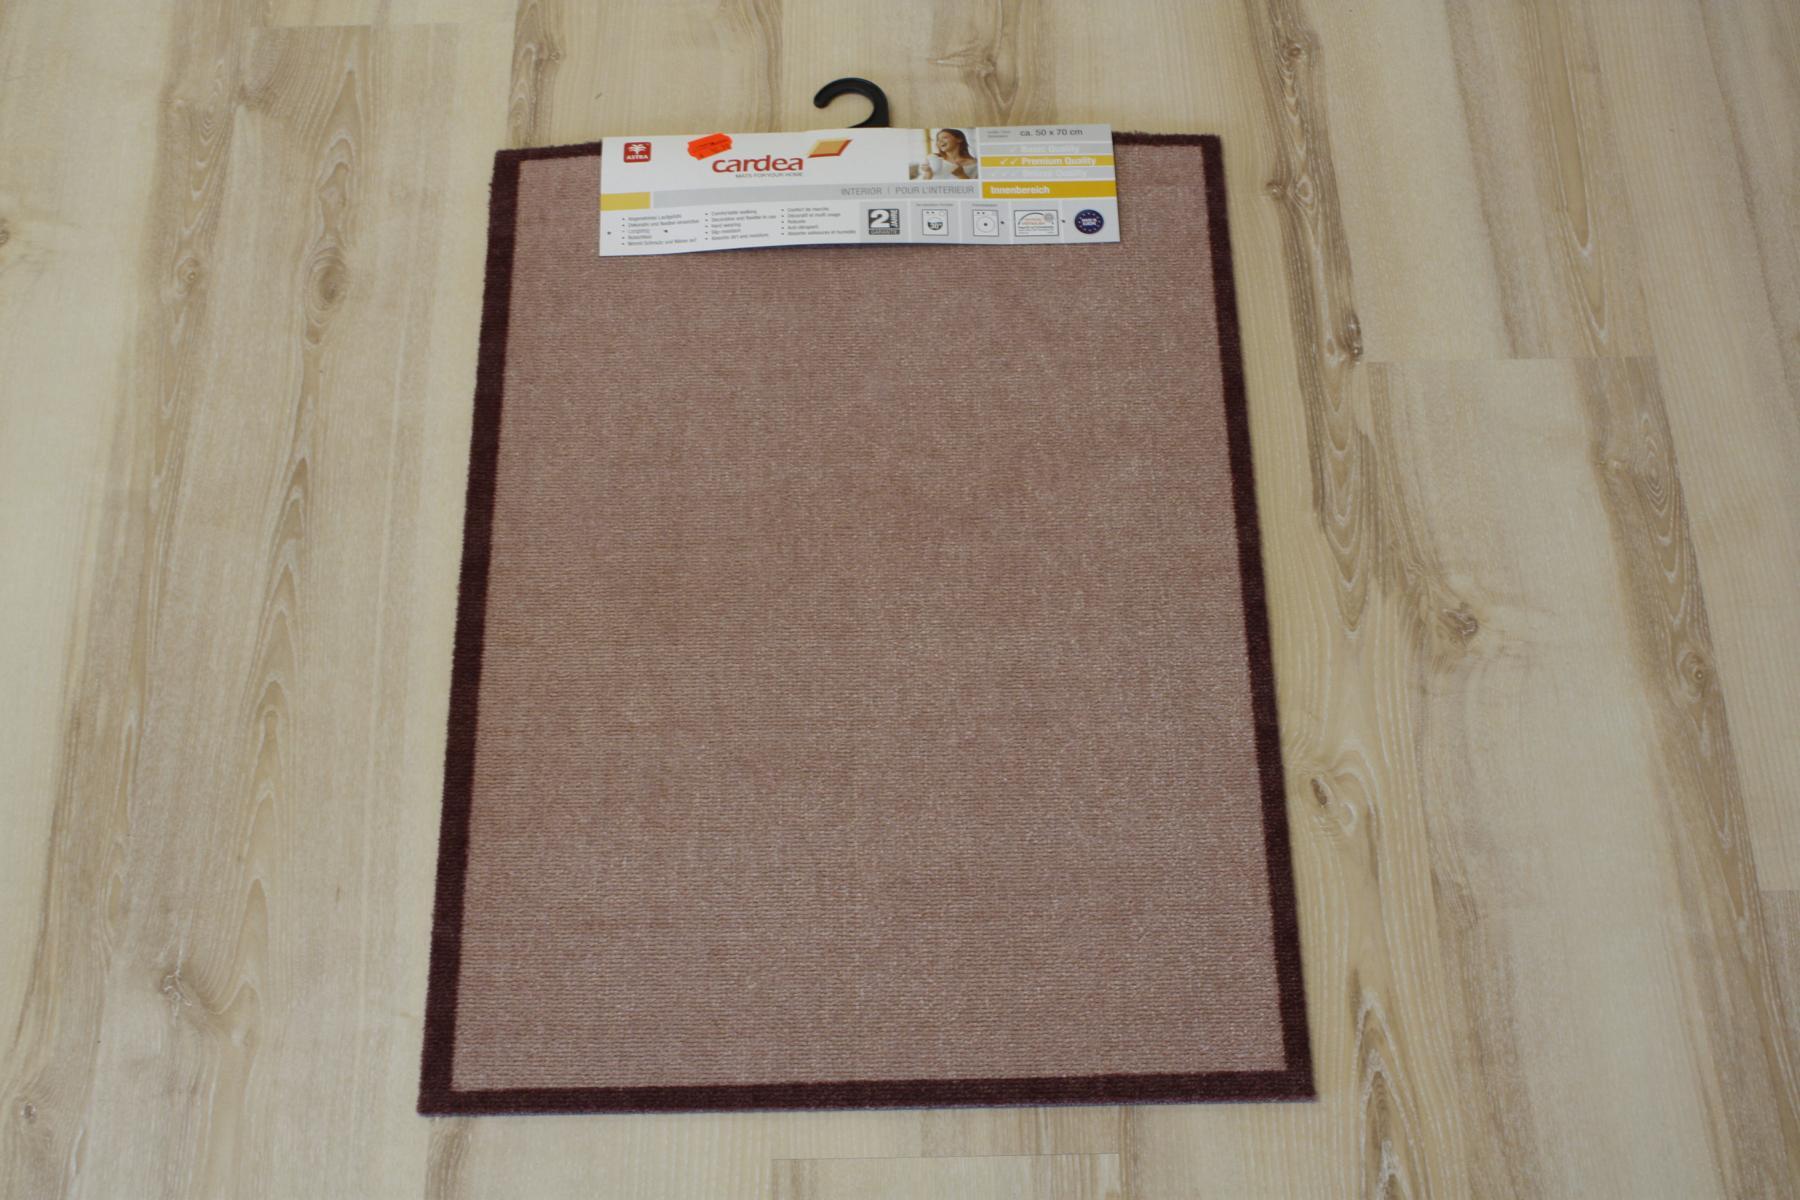 fu matte t rmatte cardea astra 10 hungry uni braun 50x70 cm waschbar ausl ebay. Black Bedroom Furniture Sets. Home Design Ideas